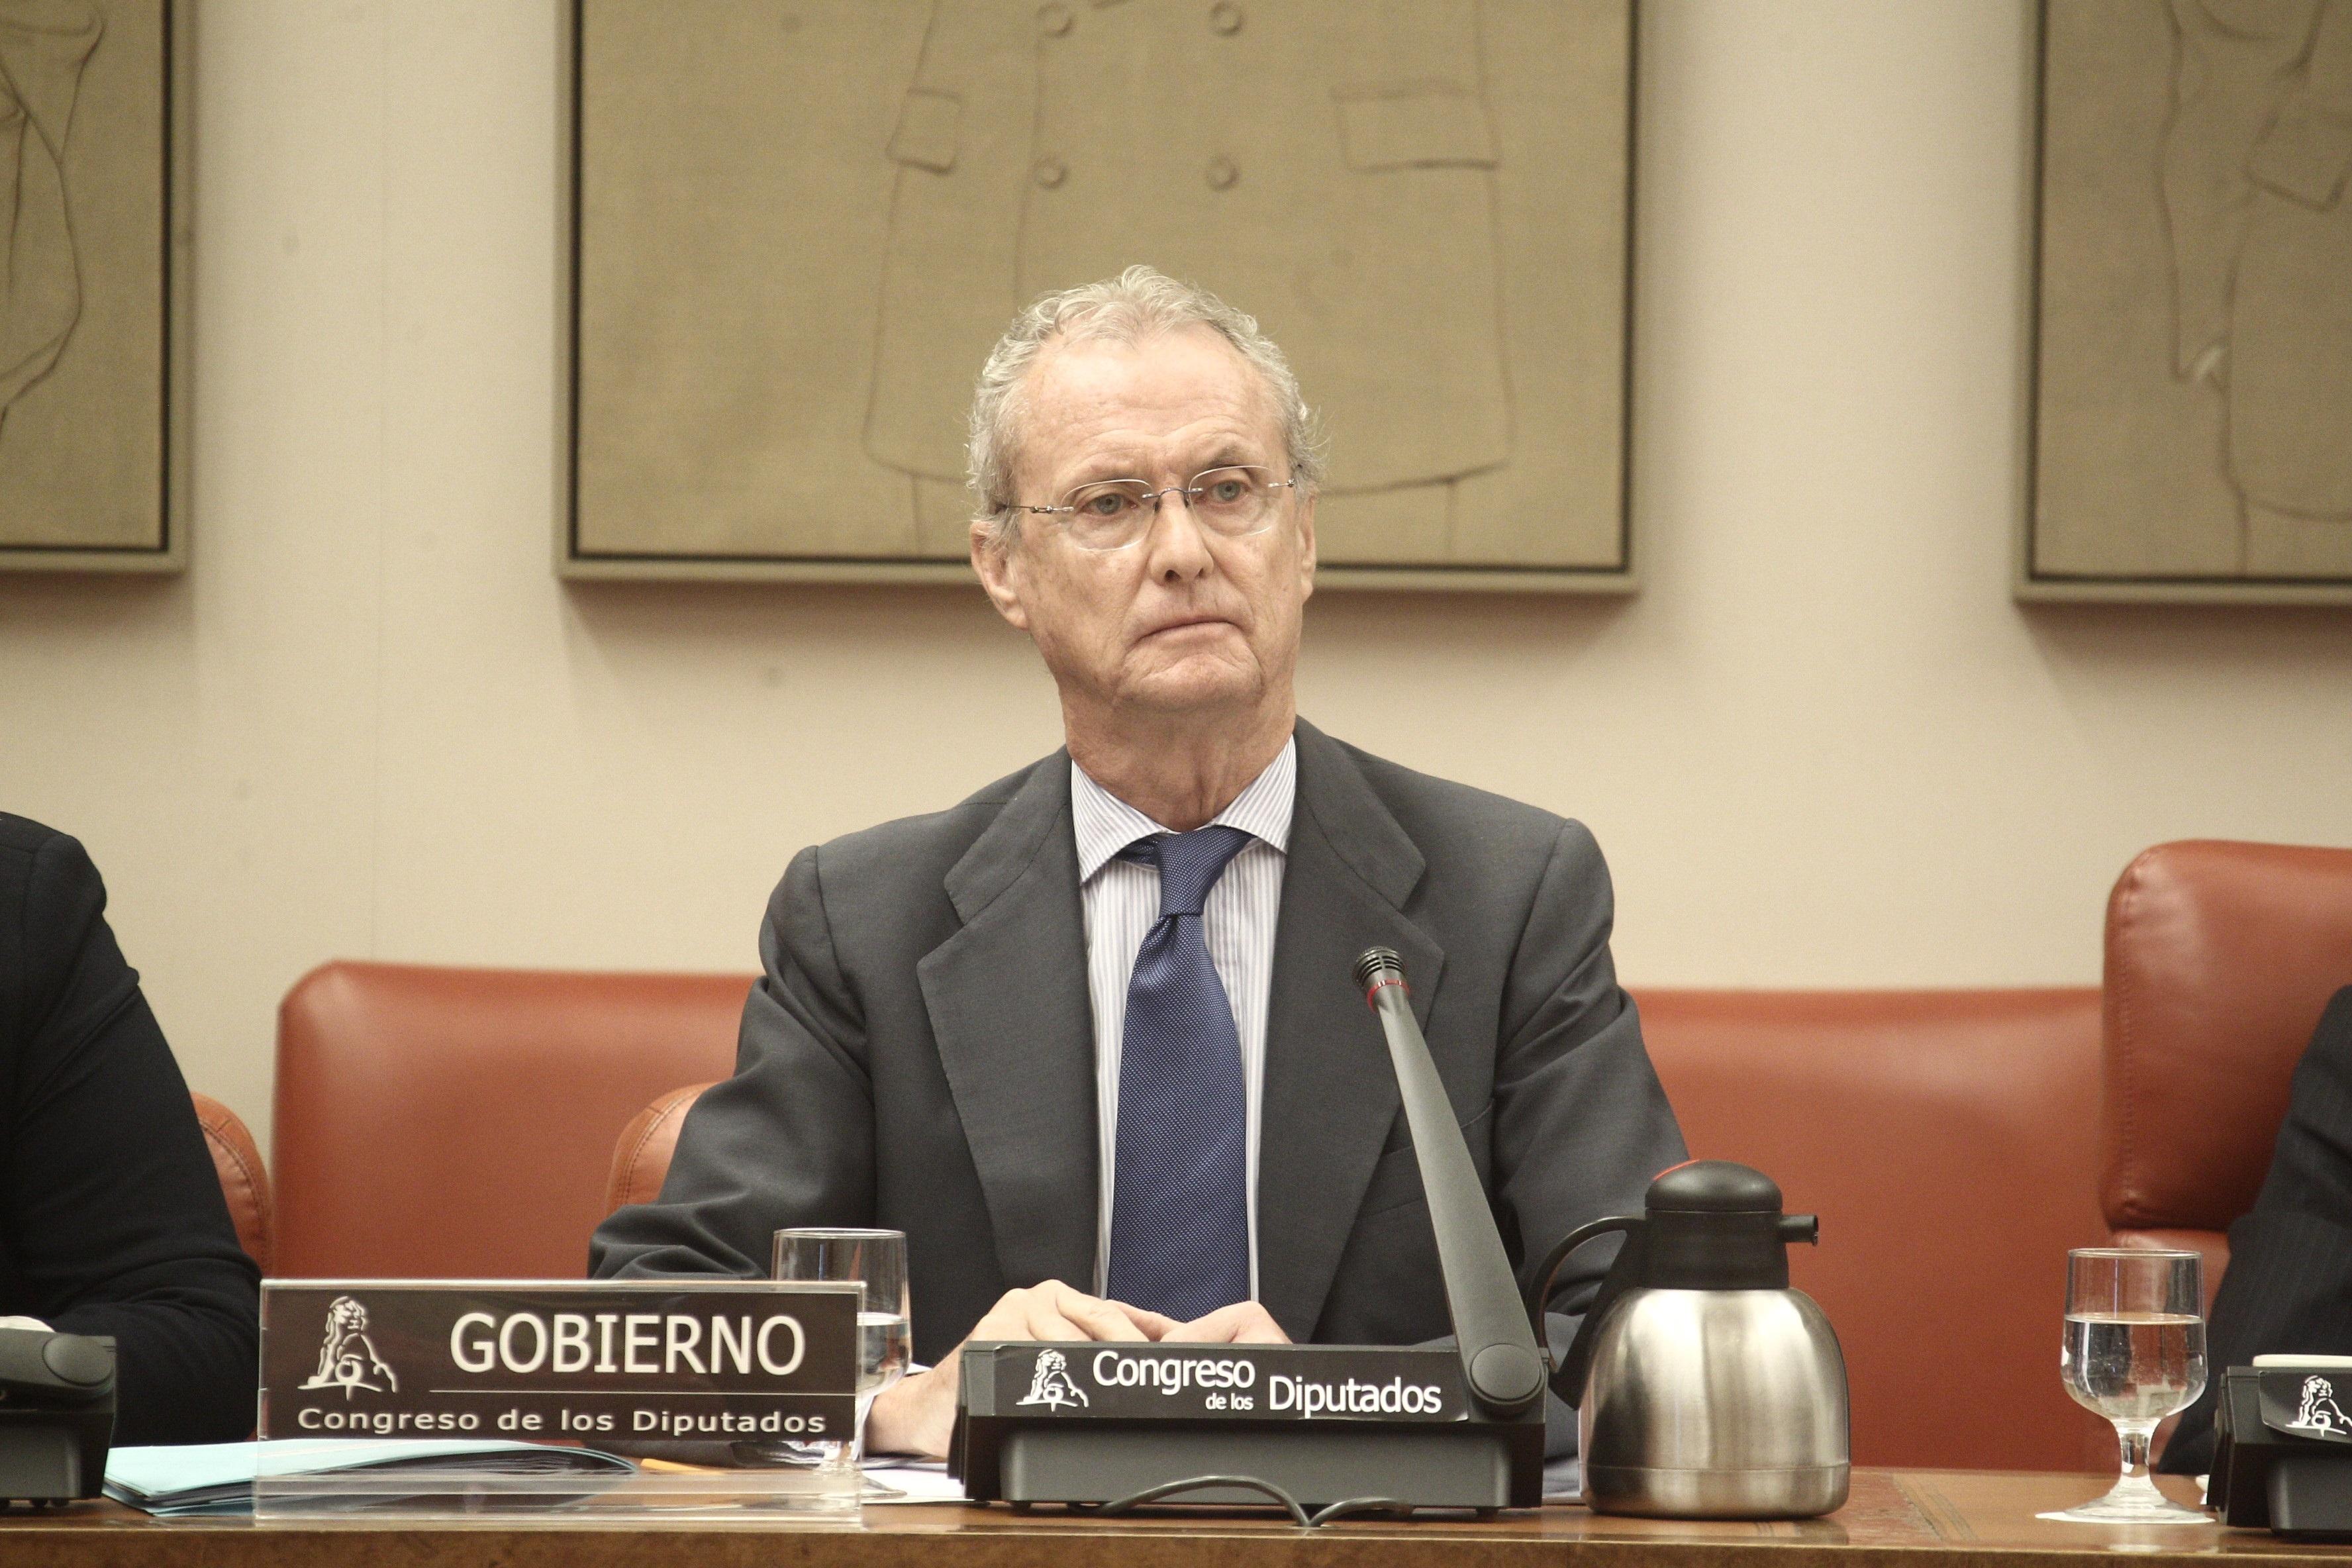 Morenés dice que el espionaje de EEUU a países e instituciones europeas no ha afectado a España